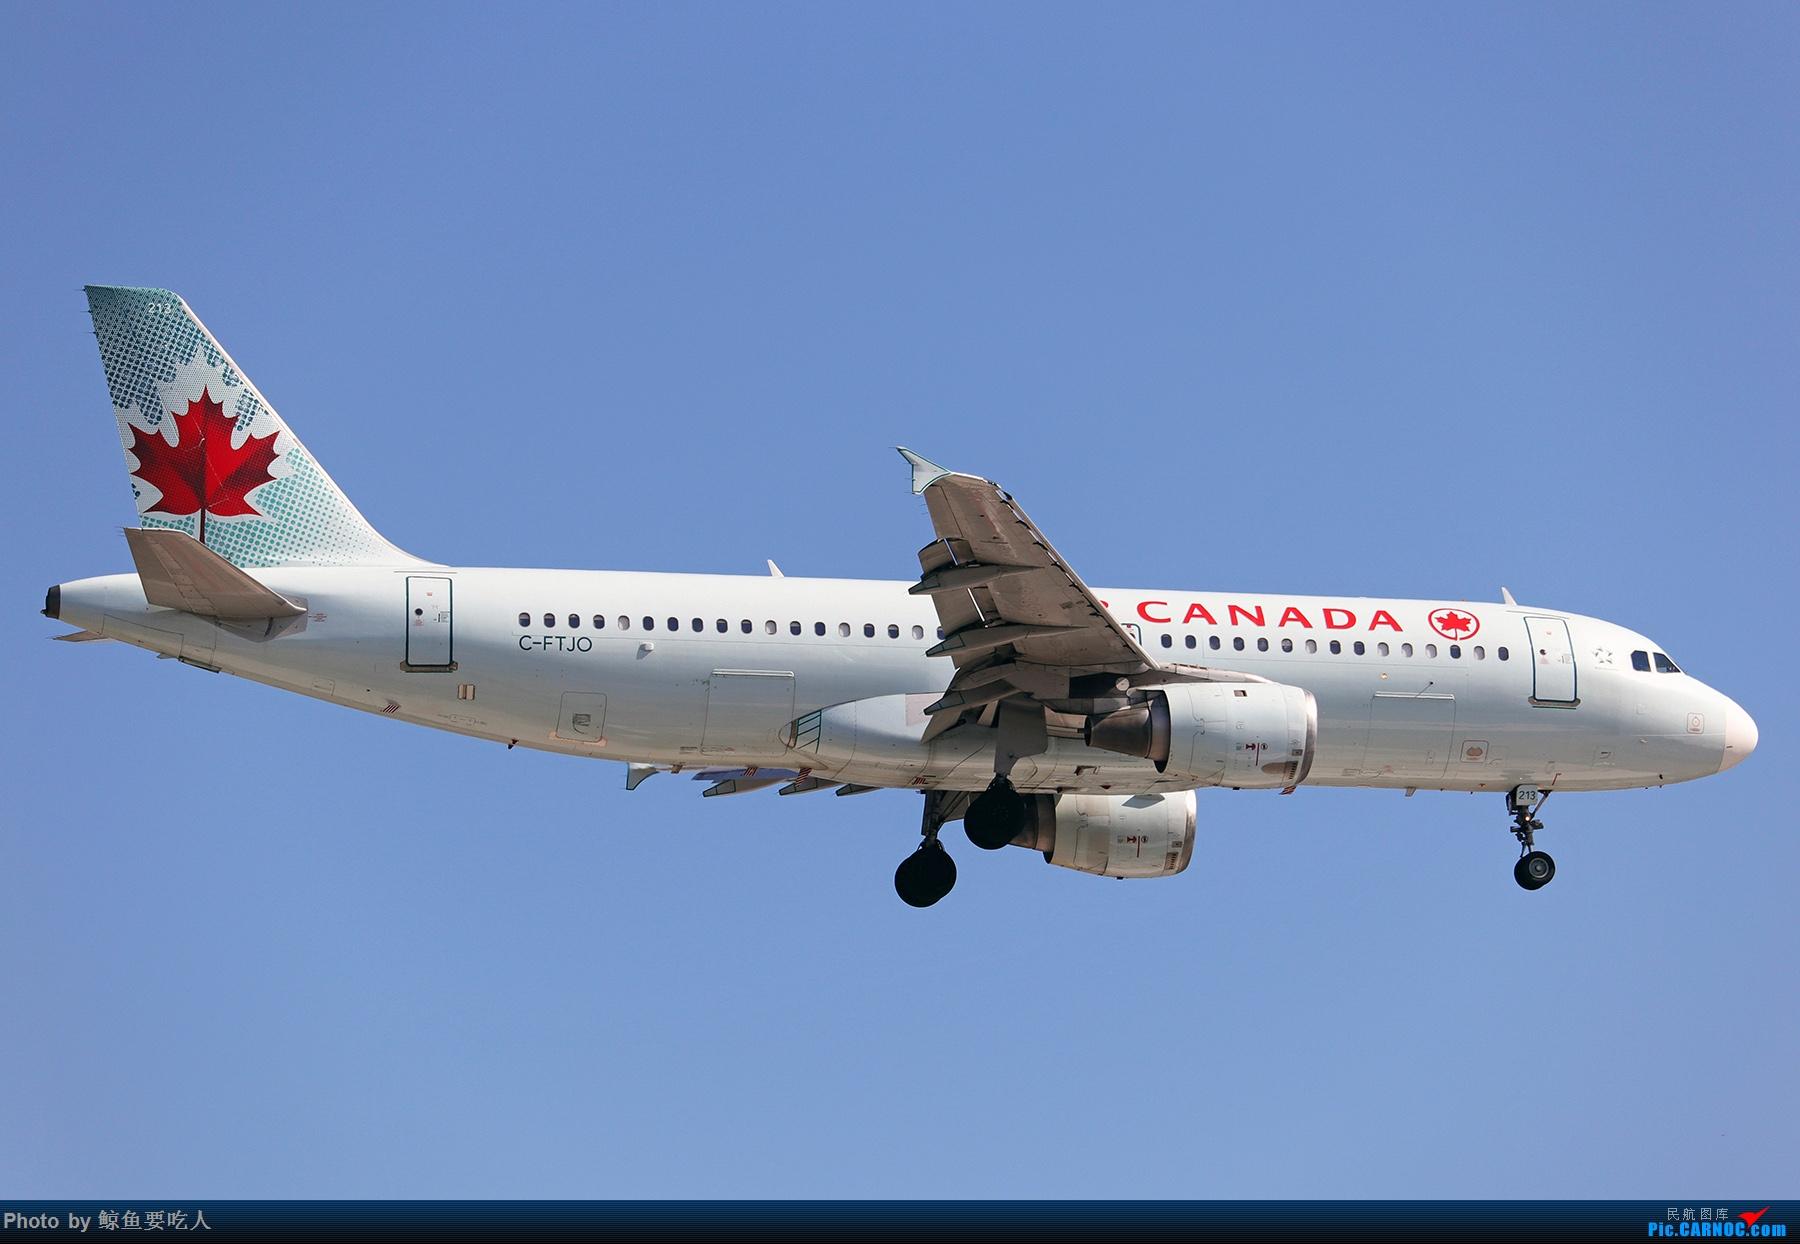 Re:[原创]【多图党】见证疫情后逐步的恢复,加拿大夏日多伦多皮尔逊机场拍机~ 乐见诸航空公司复航多伦多 AIRBUS A320-200 C-FTJO 多伦多皮尔逊国际机场